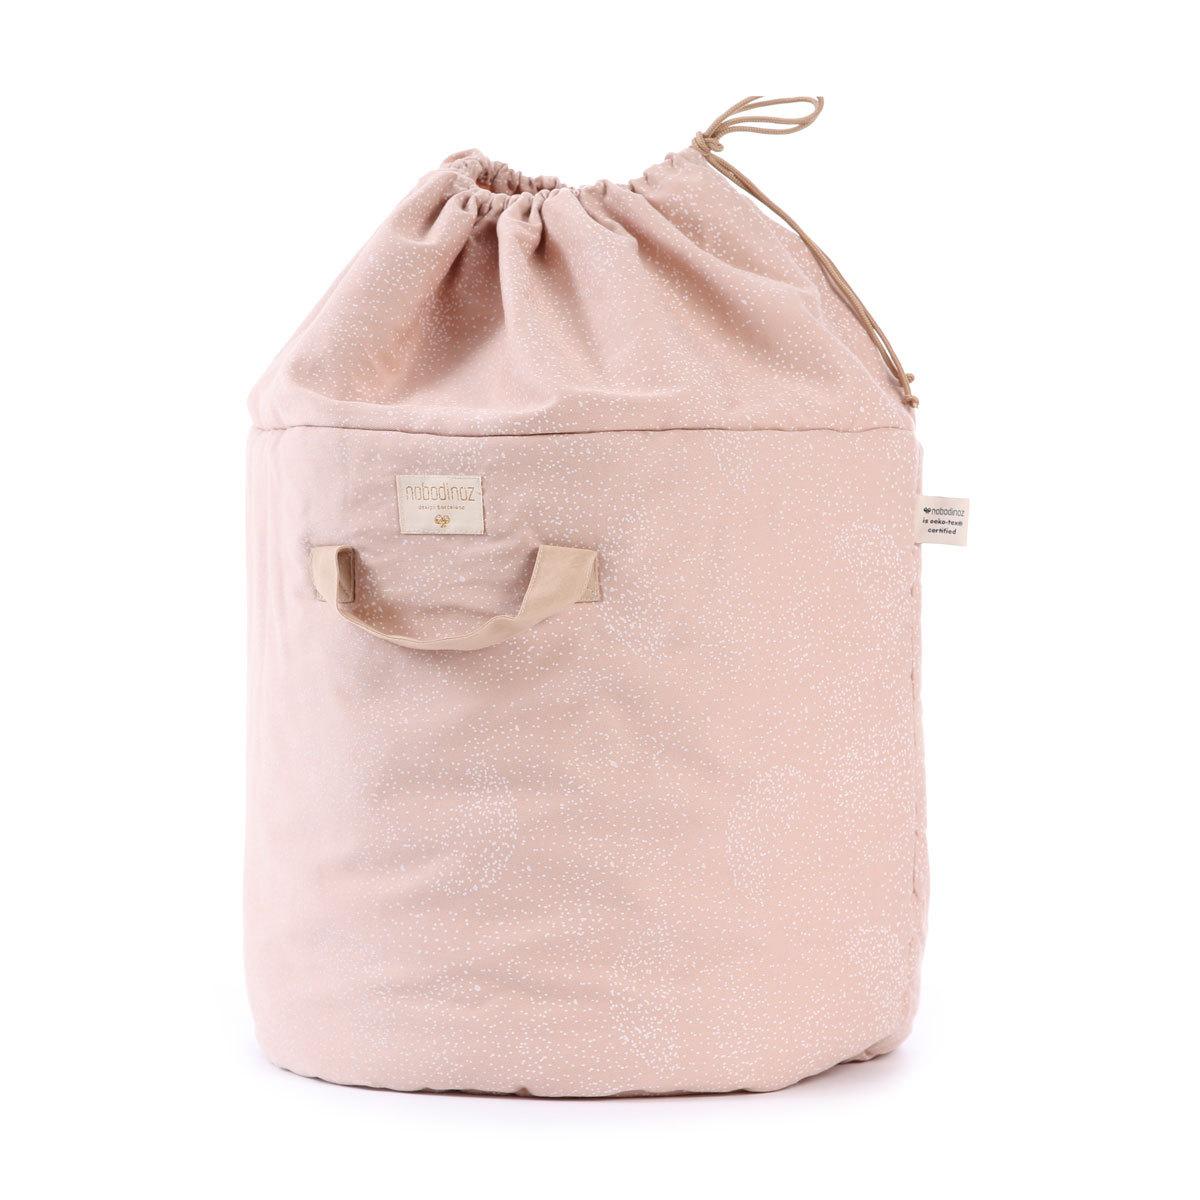 Rangement jouet Sac à Jouets Bamboo - White Bubble & Misty Pink Sac à Jouets Bamboo - White Bubble & Misty Pink